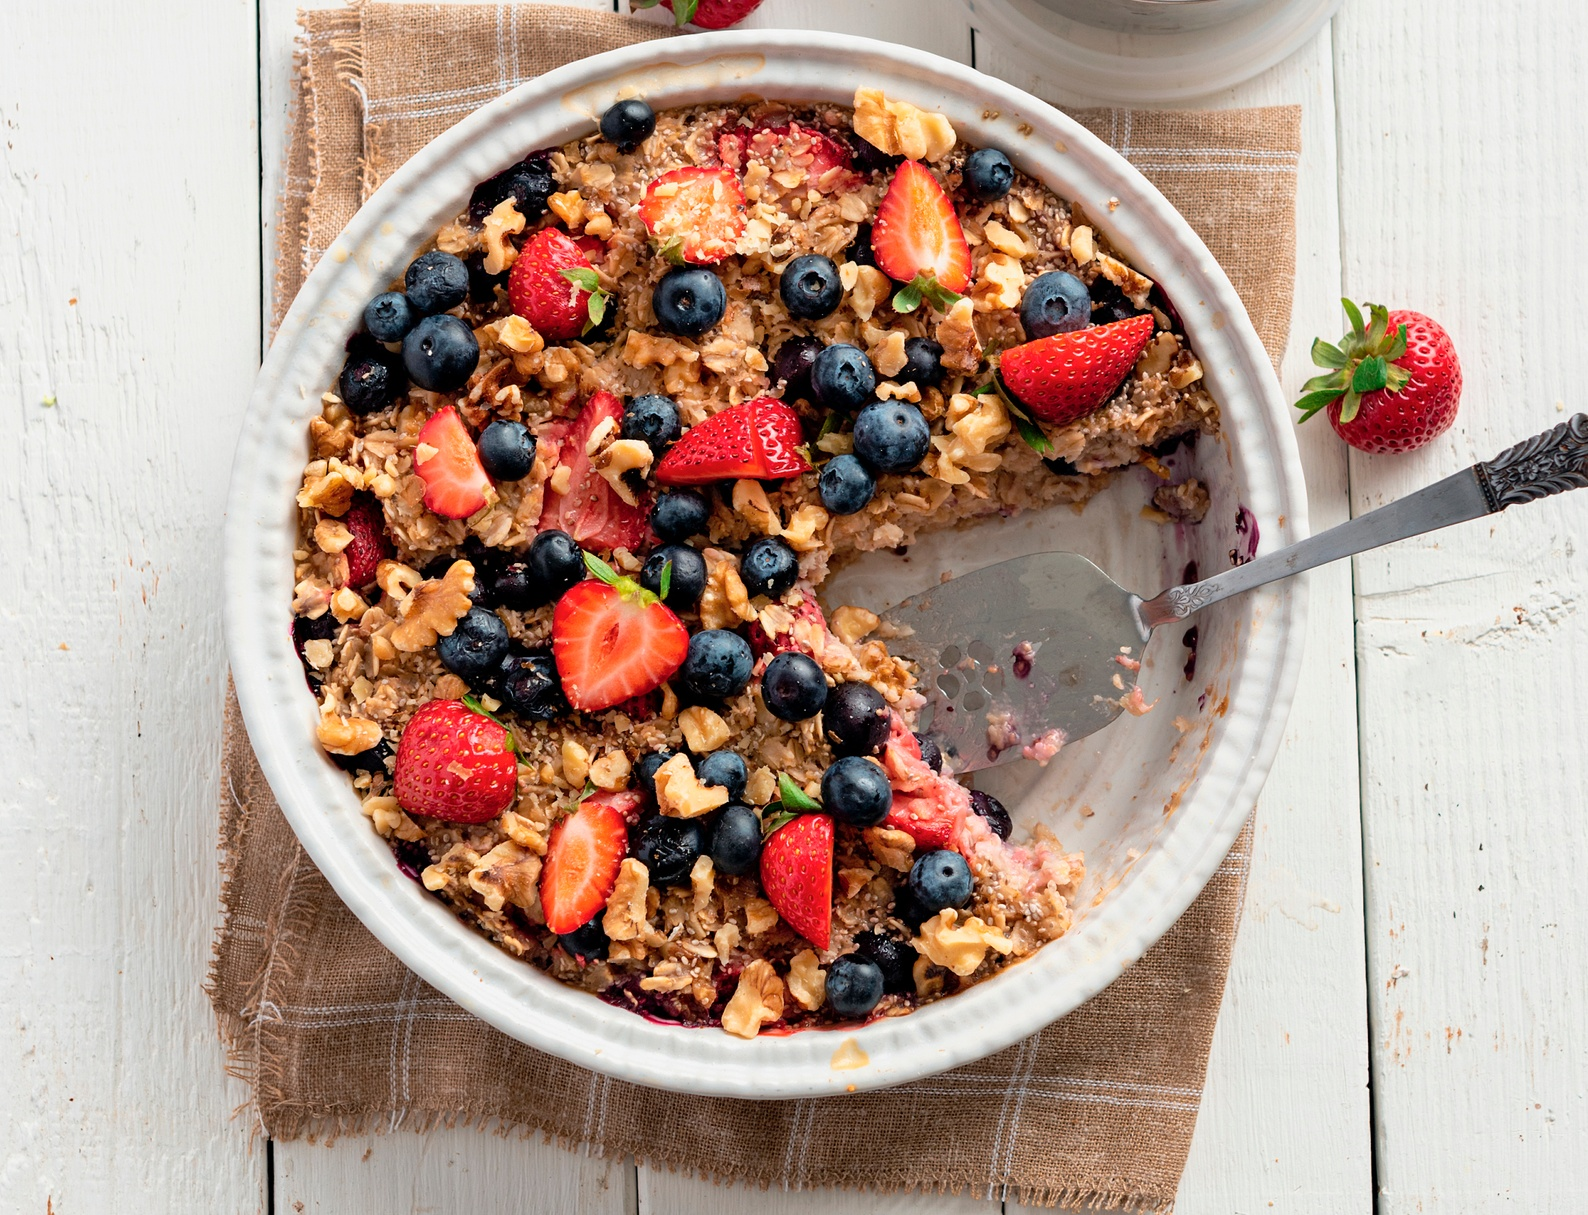 TikTok: Creative Oatmeal Recipes